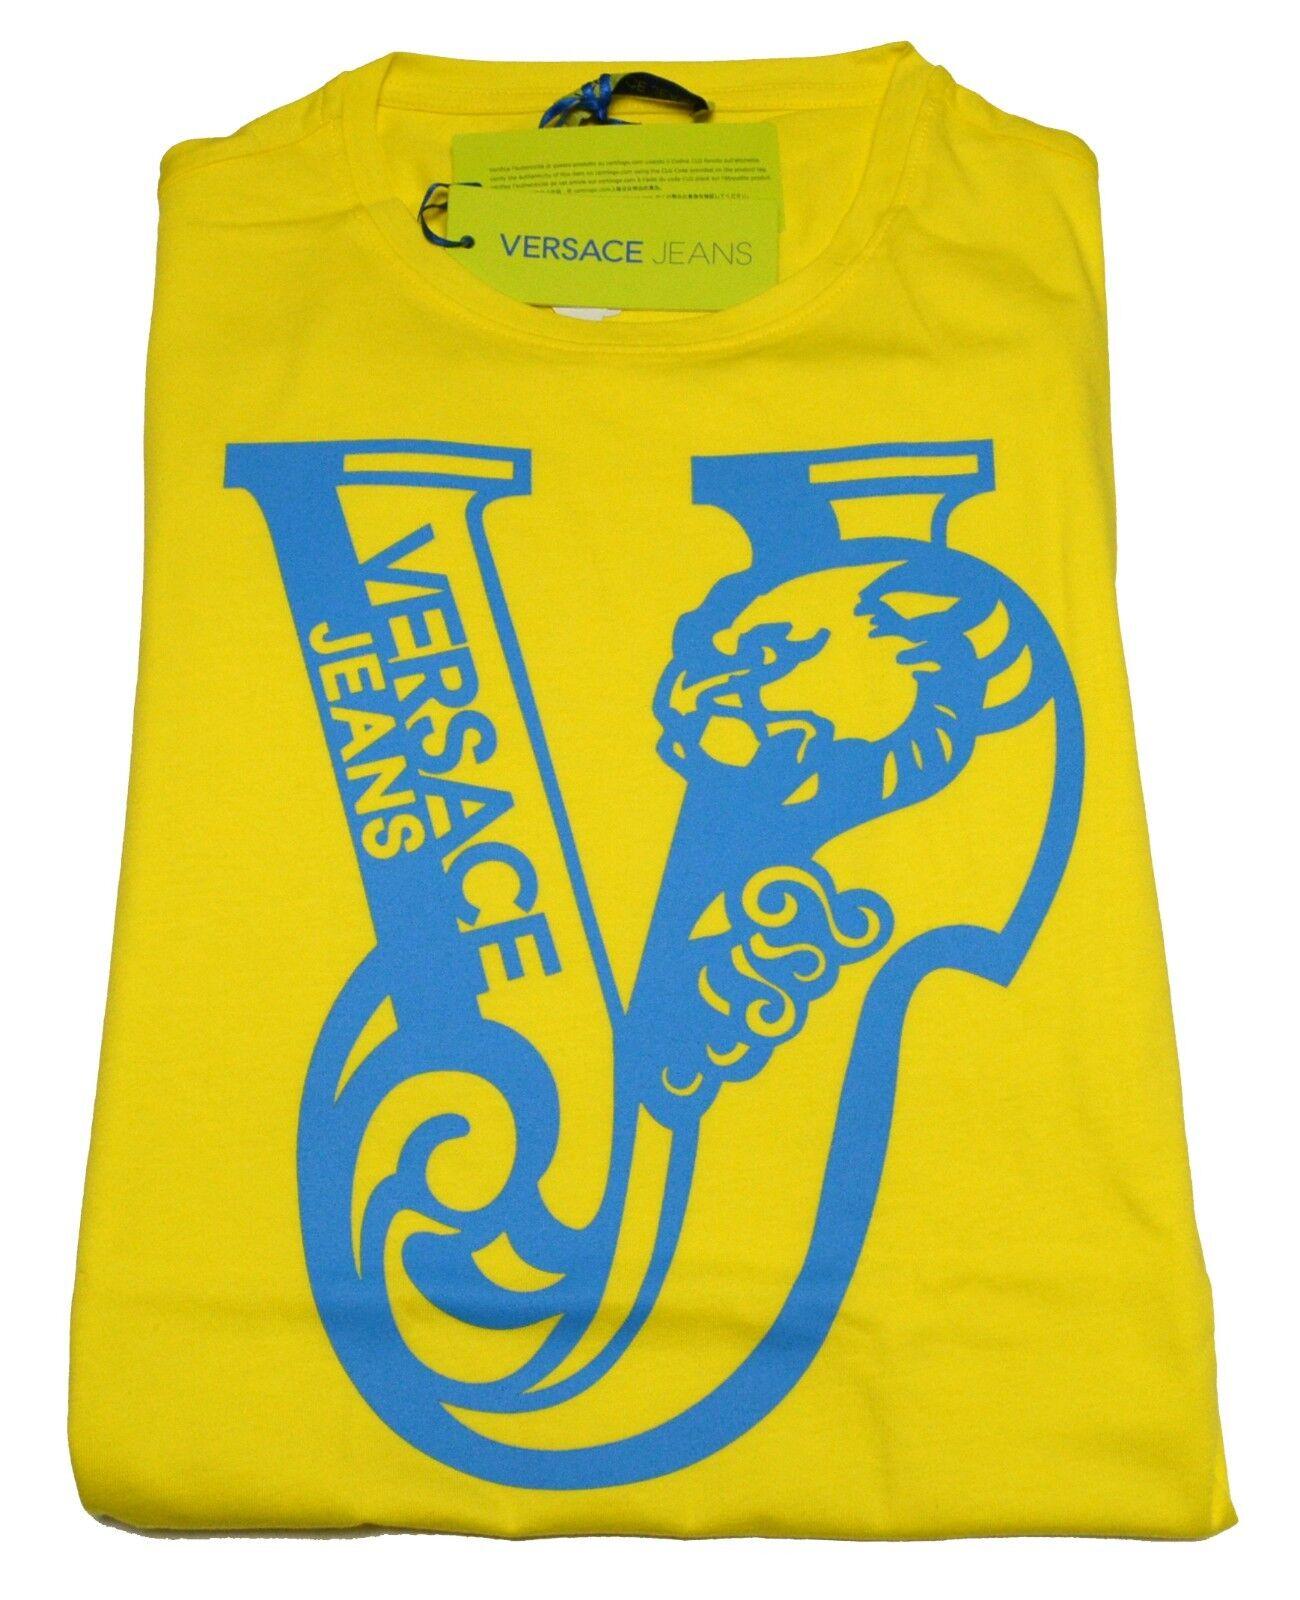 T-shirt Gianni Versace Jeans Men  Fashion T-shirt Mens Jersey Cotton Yellow